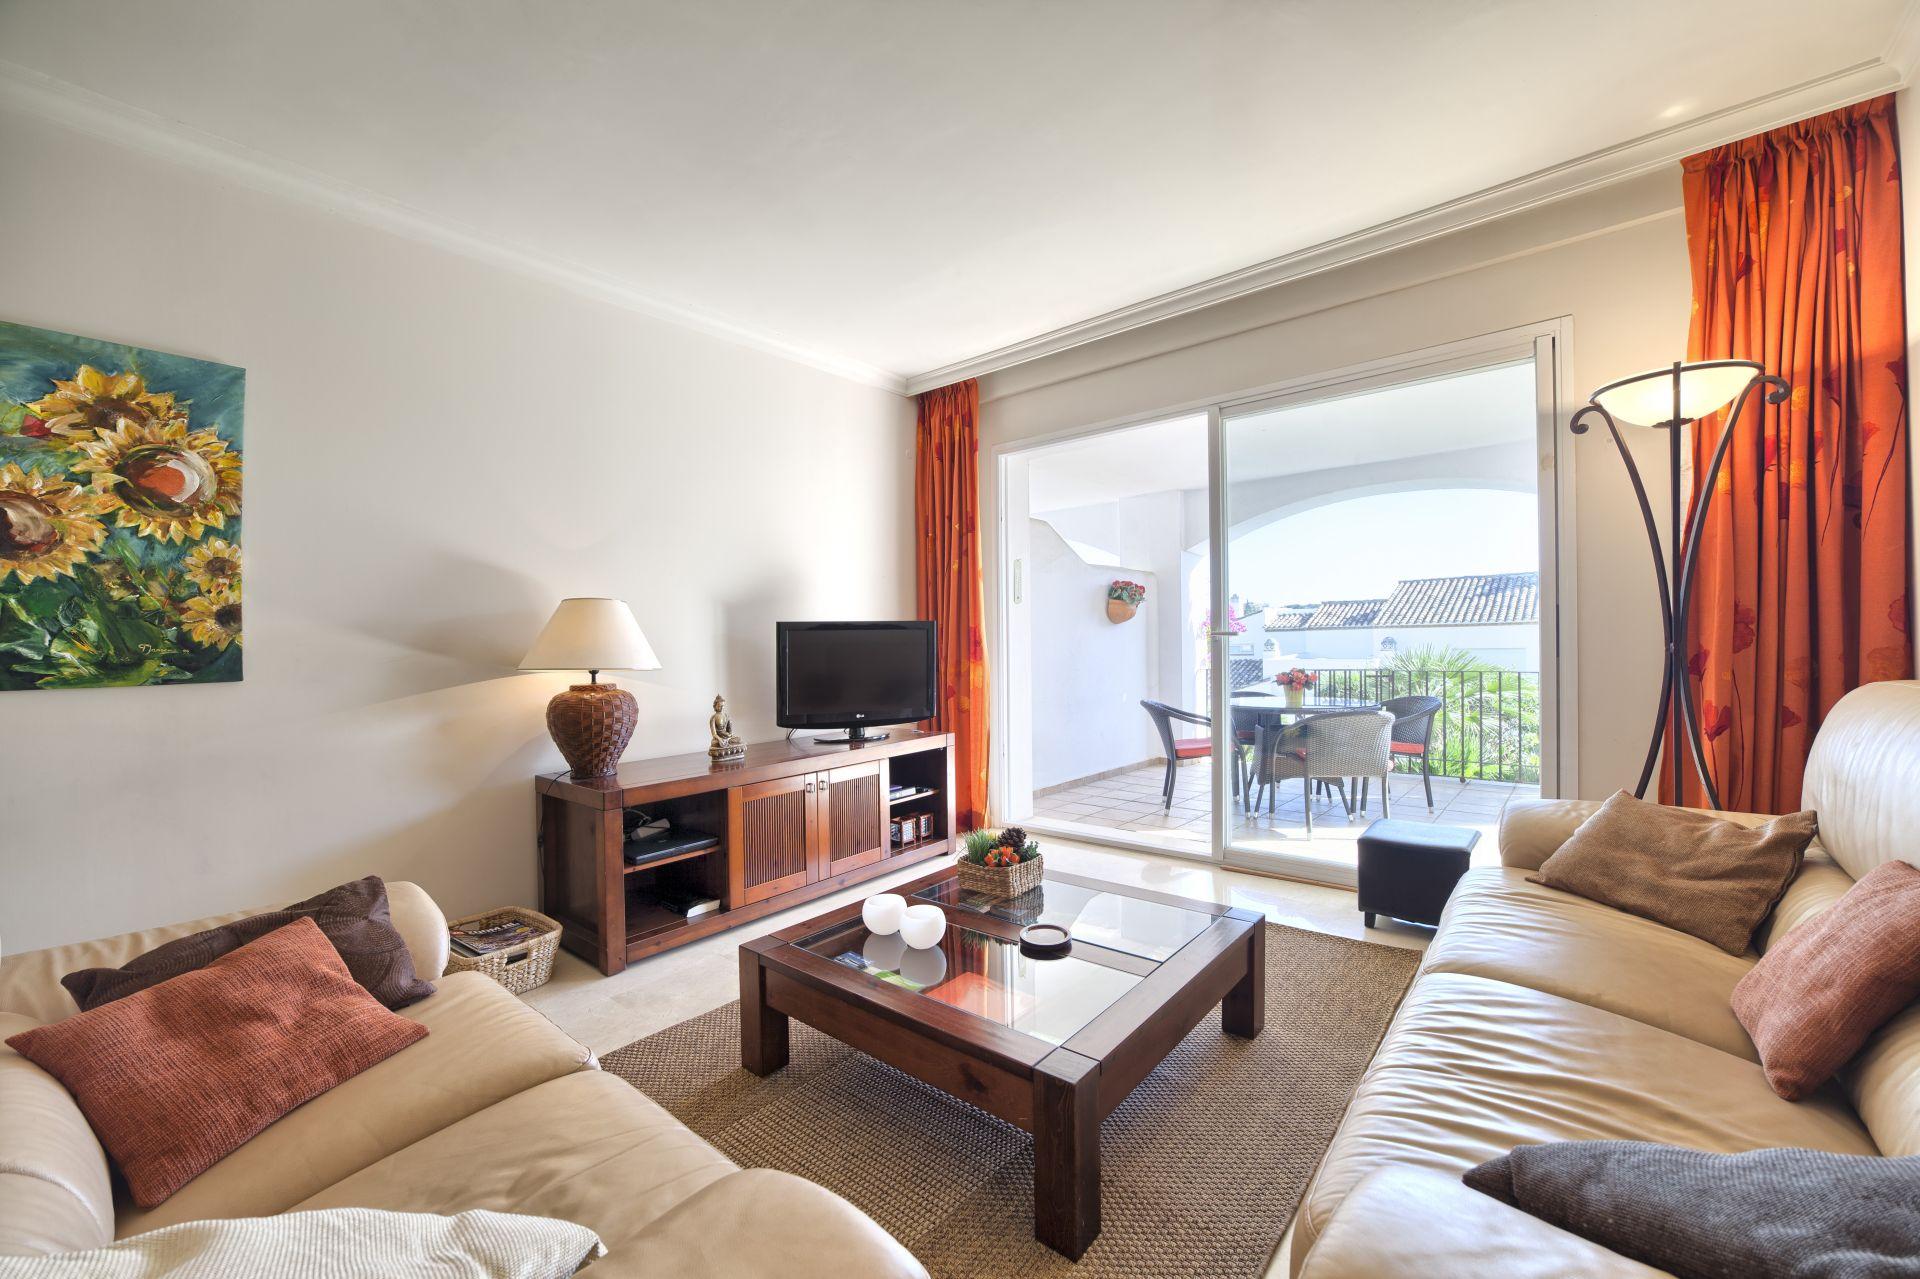 gepflegte wohnung zu verkaufen in altos de la quinta in benahavis. Black Bedroom Furniture Sets. Home Design Ideas